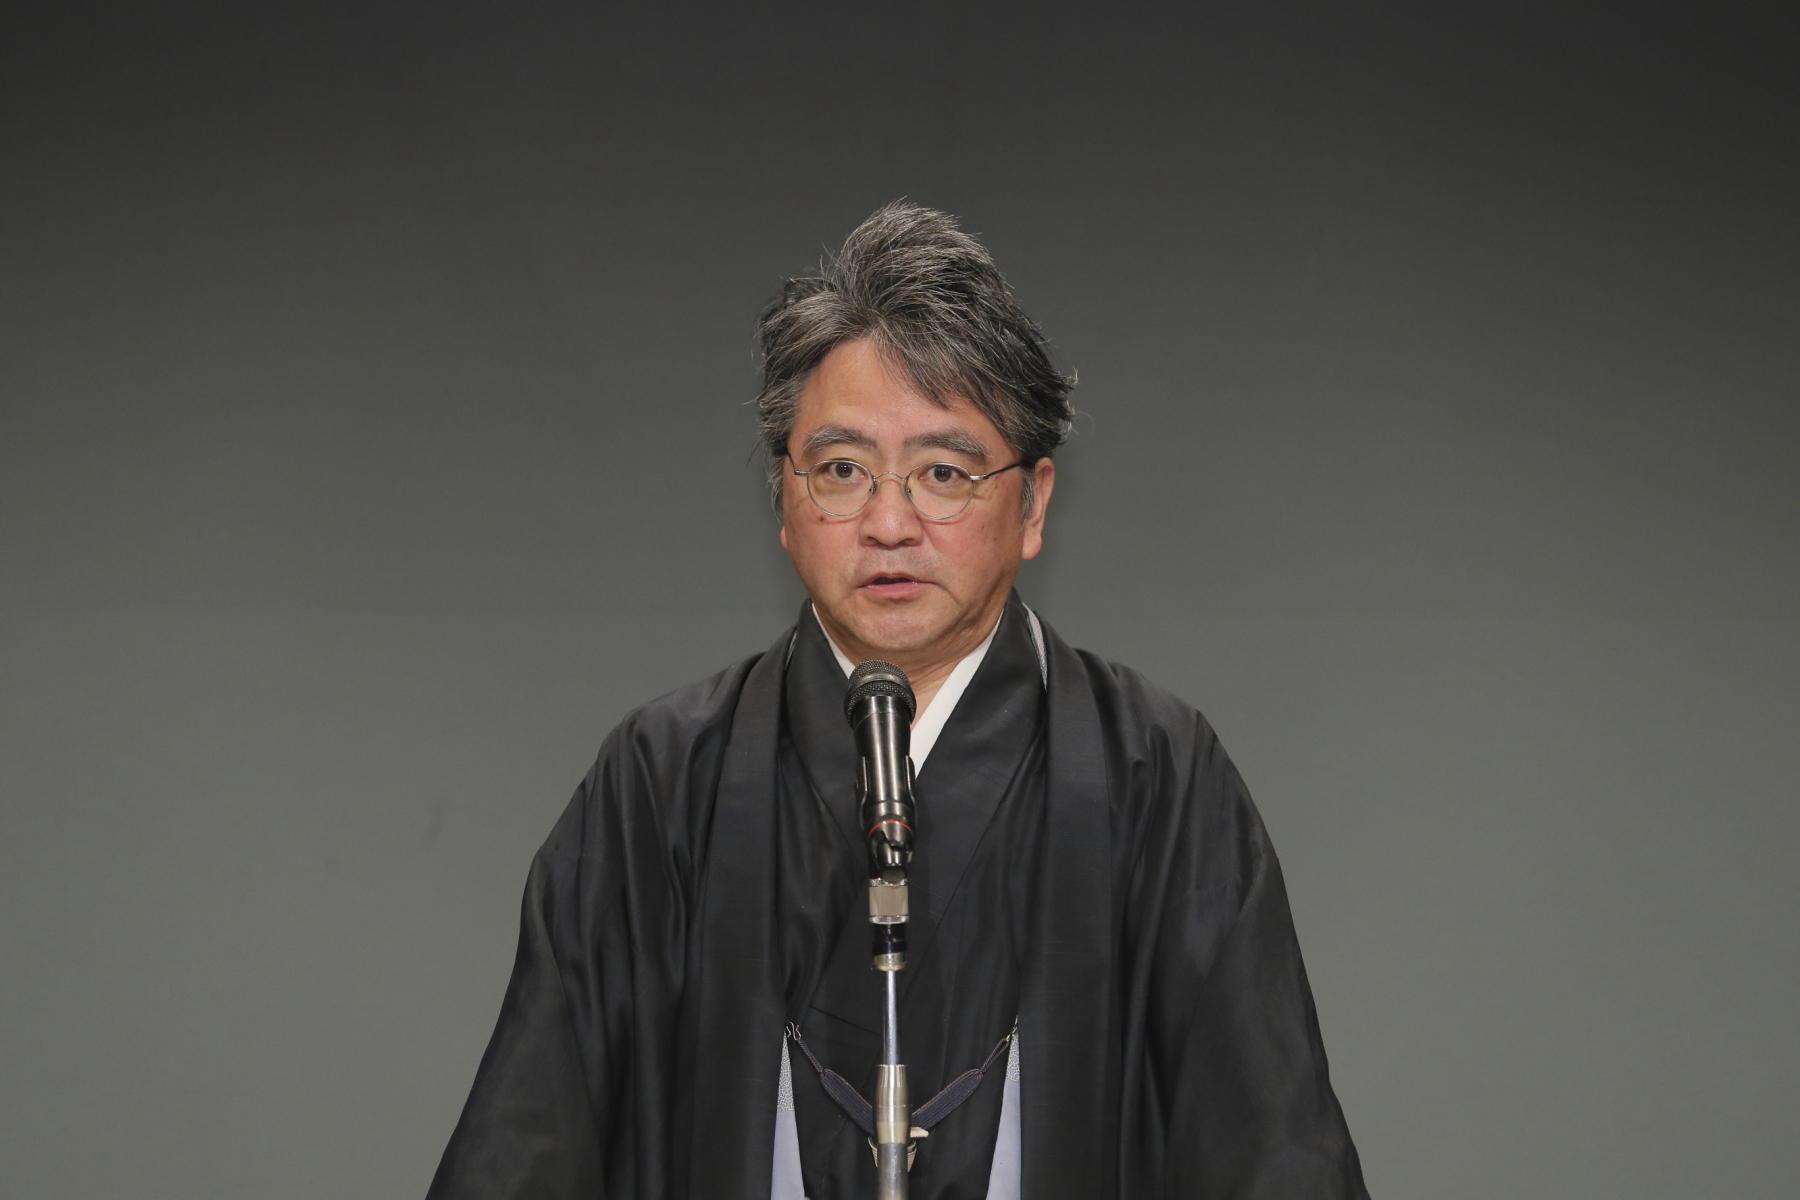 http://news.yoshimoto.co.jp/20180307170037-79613bf089d0a233c99037f4d73136dcd433e8f5.jpg